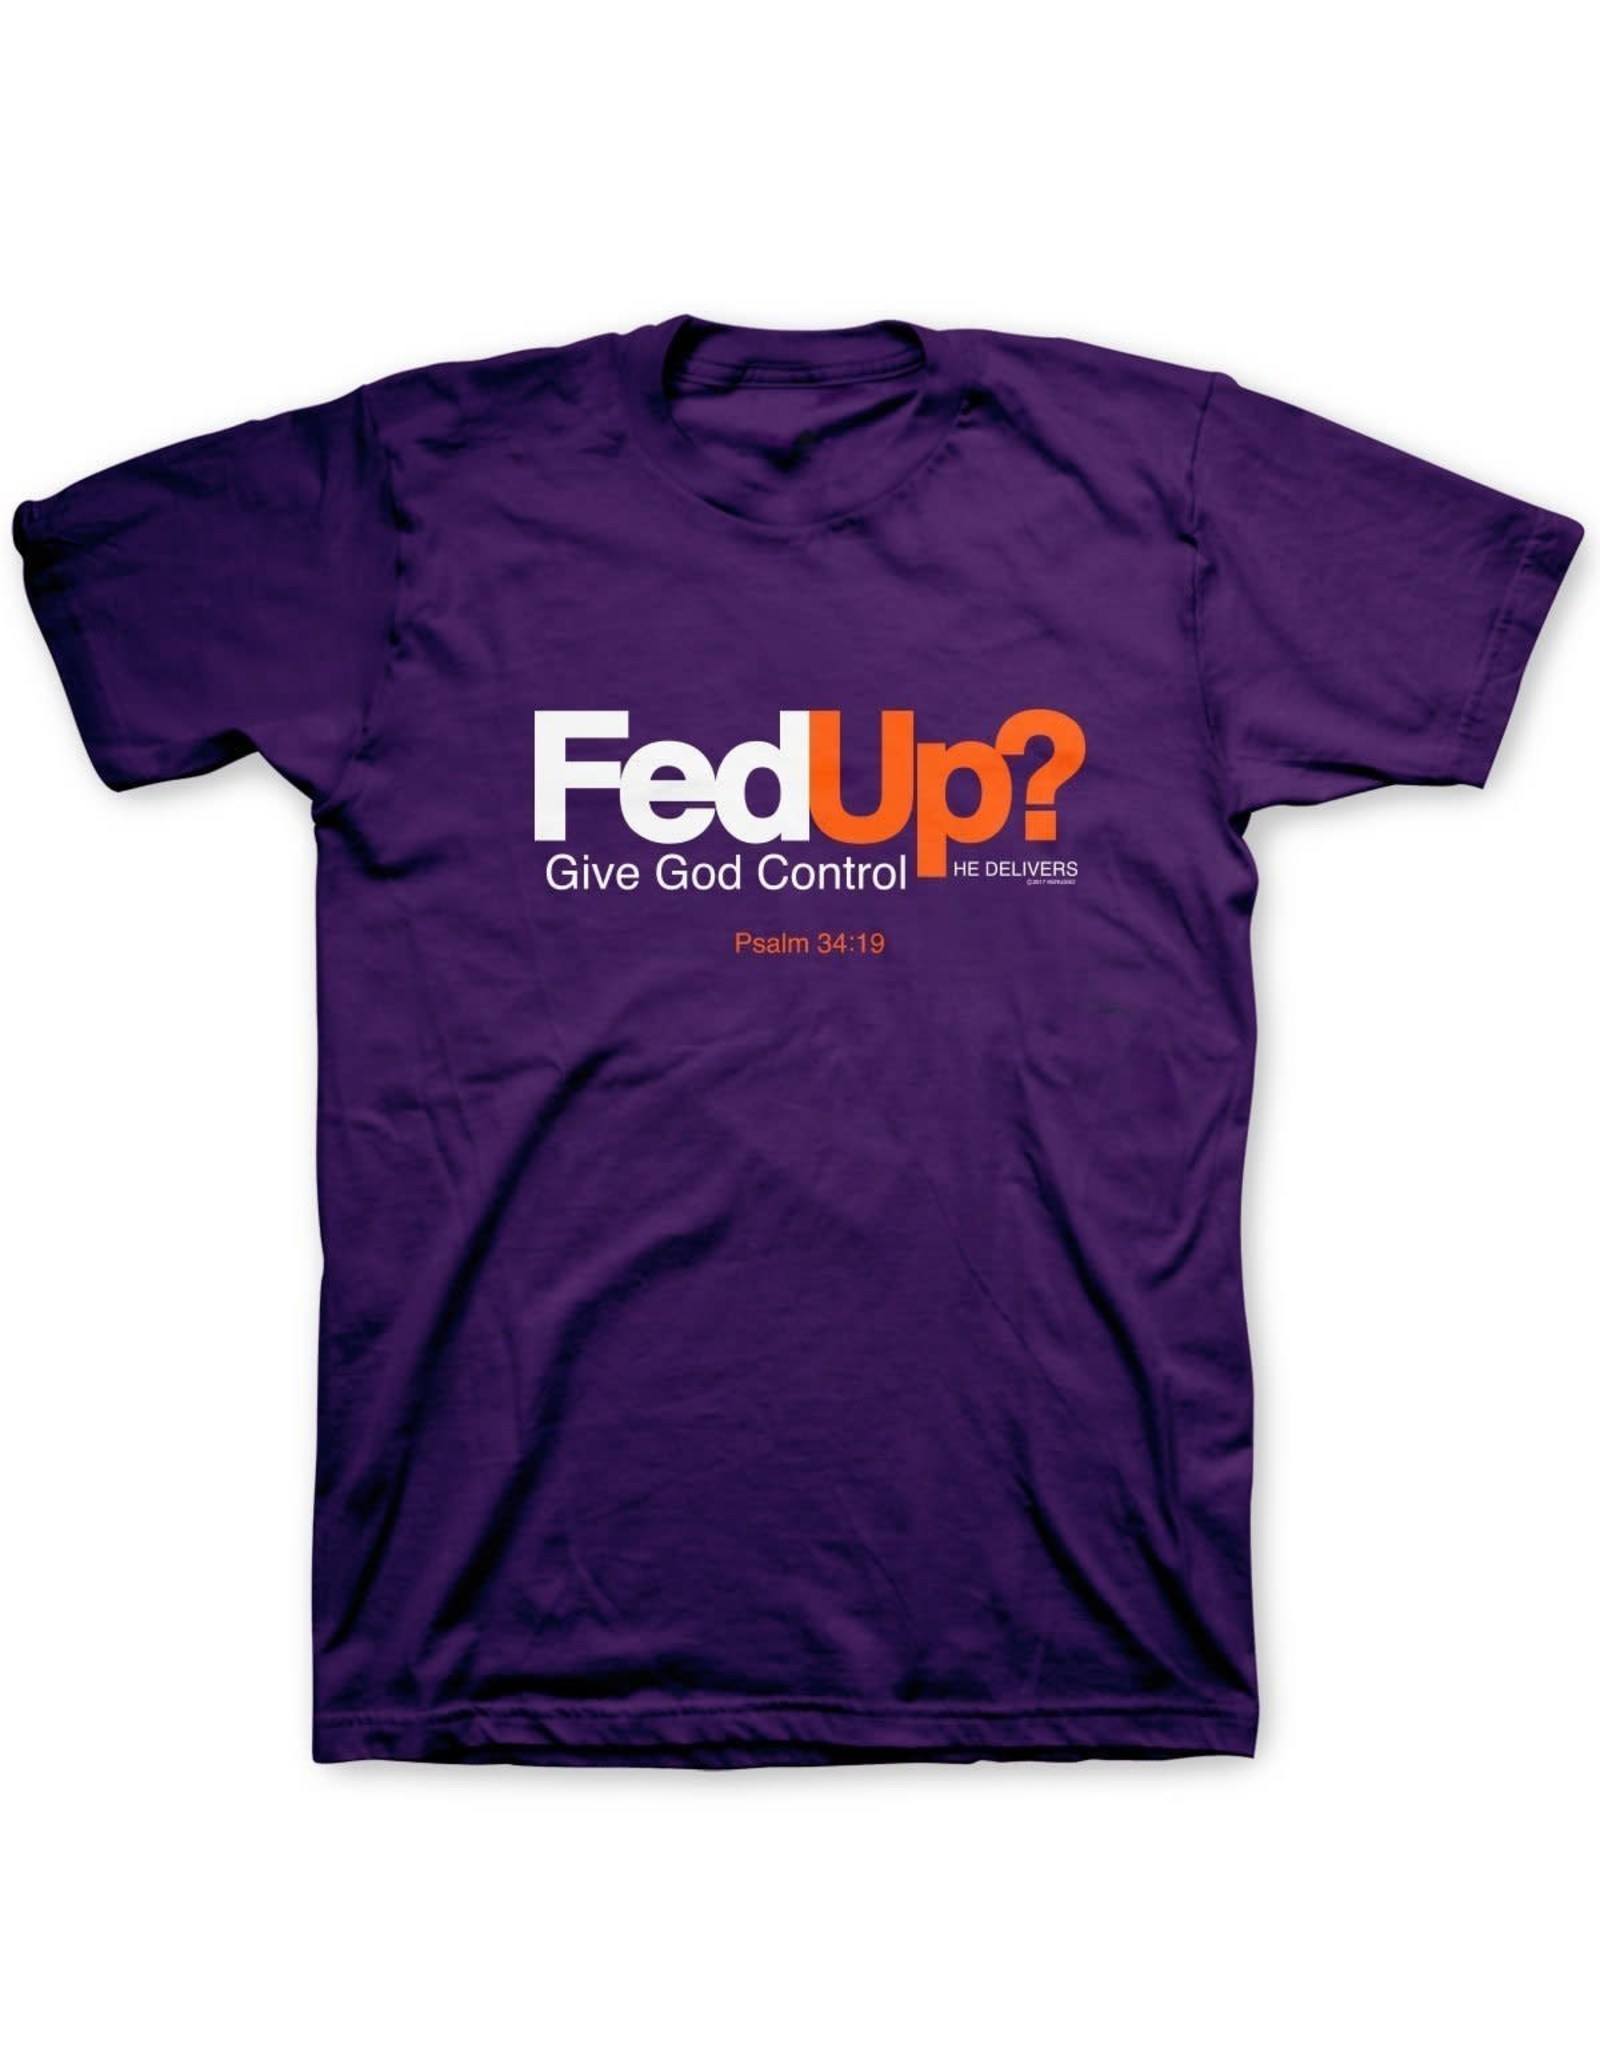 Adult Shirt - FedUp?